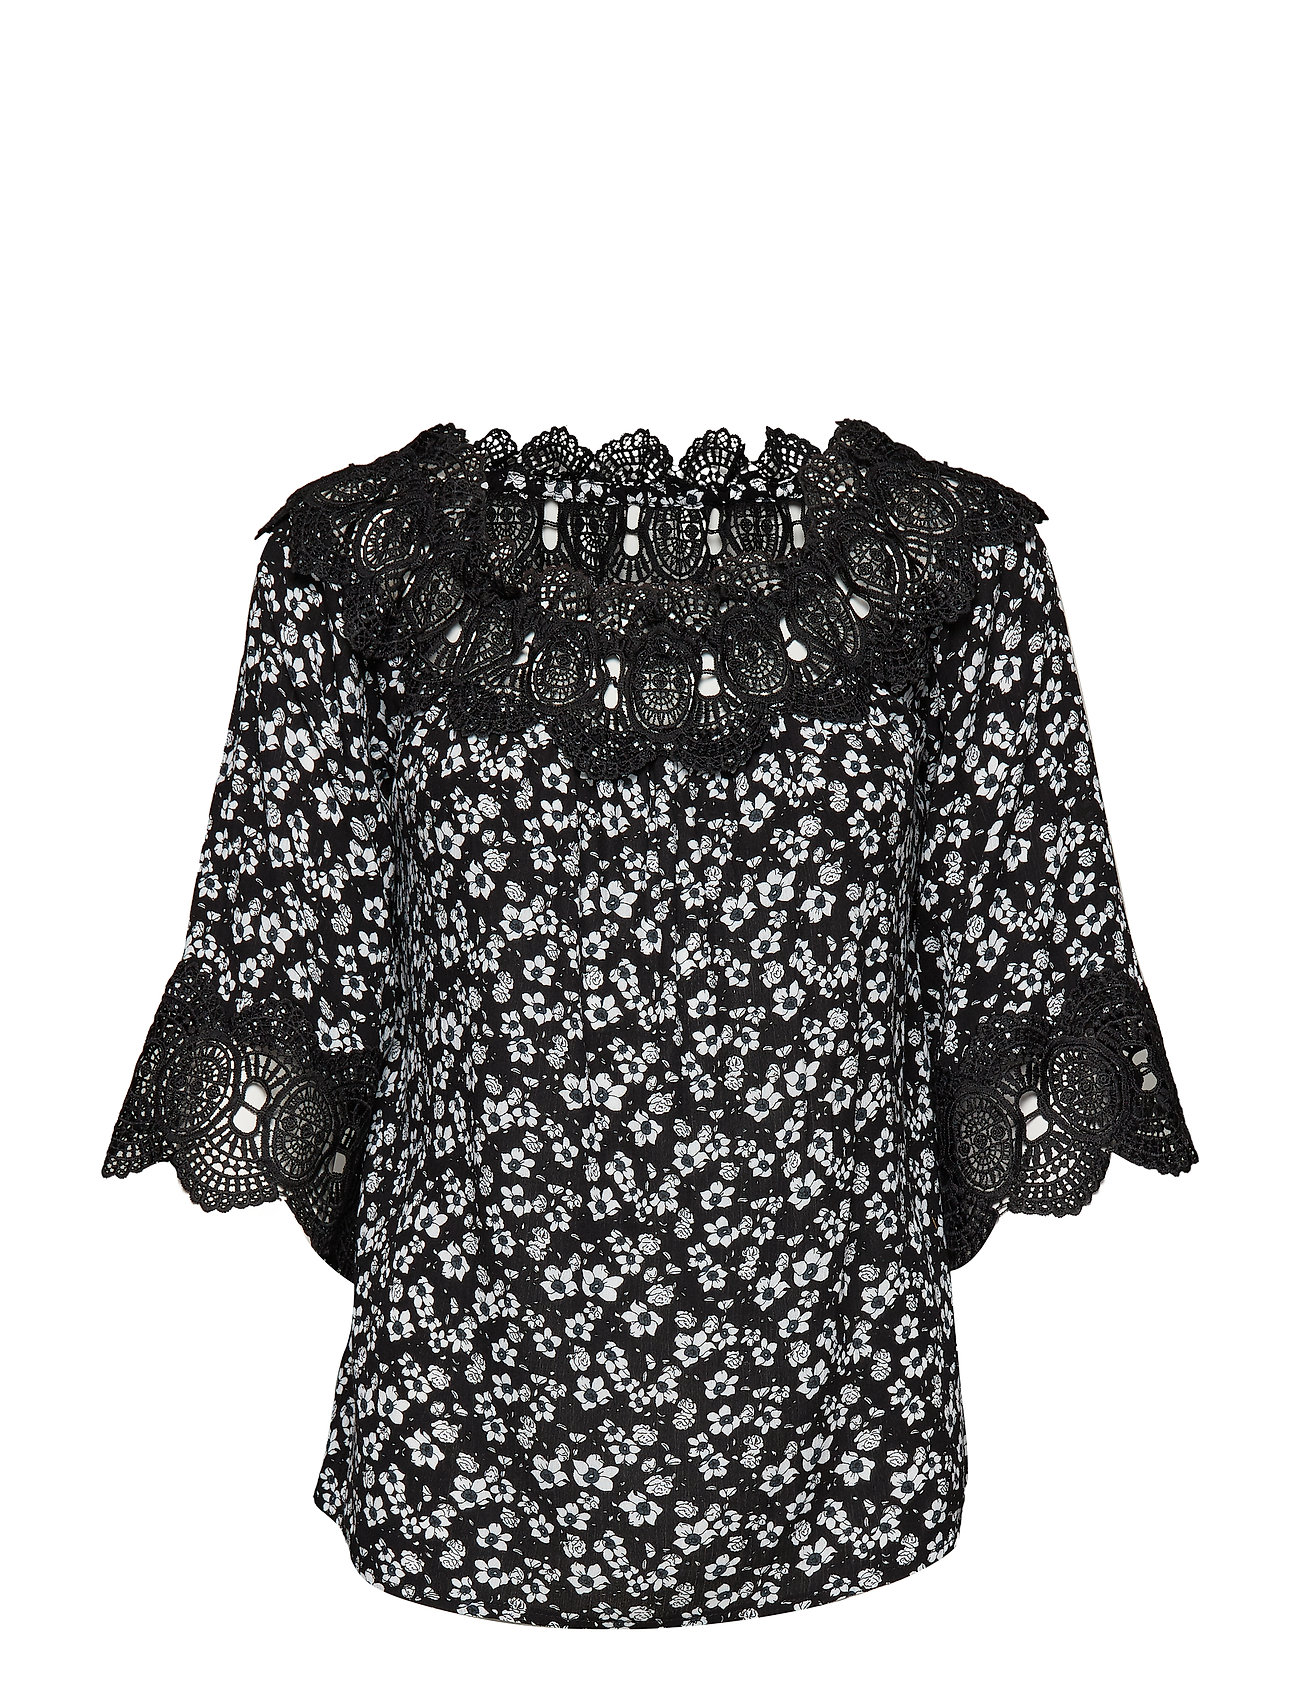 Cream Bea print blouse - PITCH BLACK / PITCH BLACK LACE